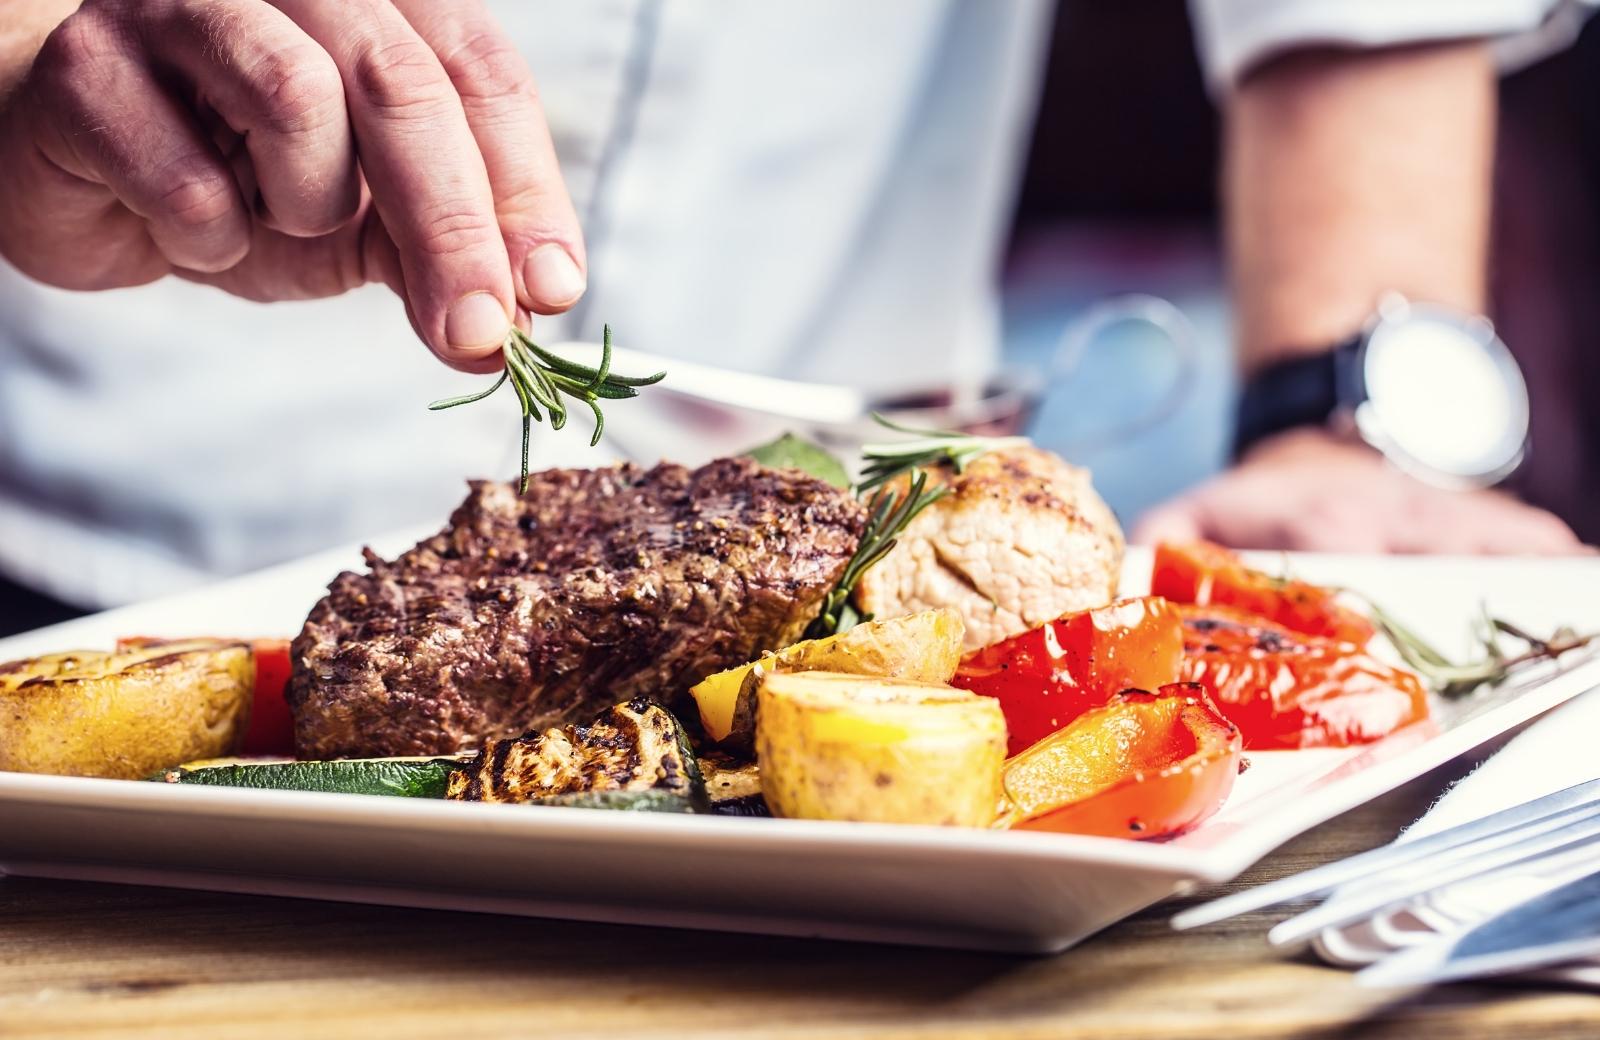 chef preparing steak